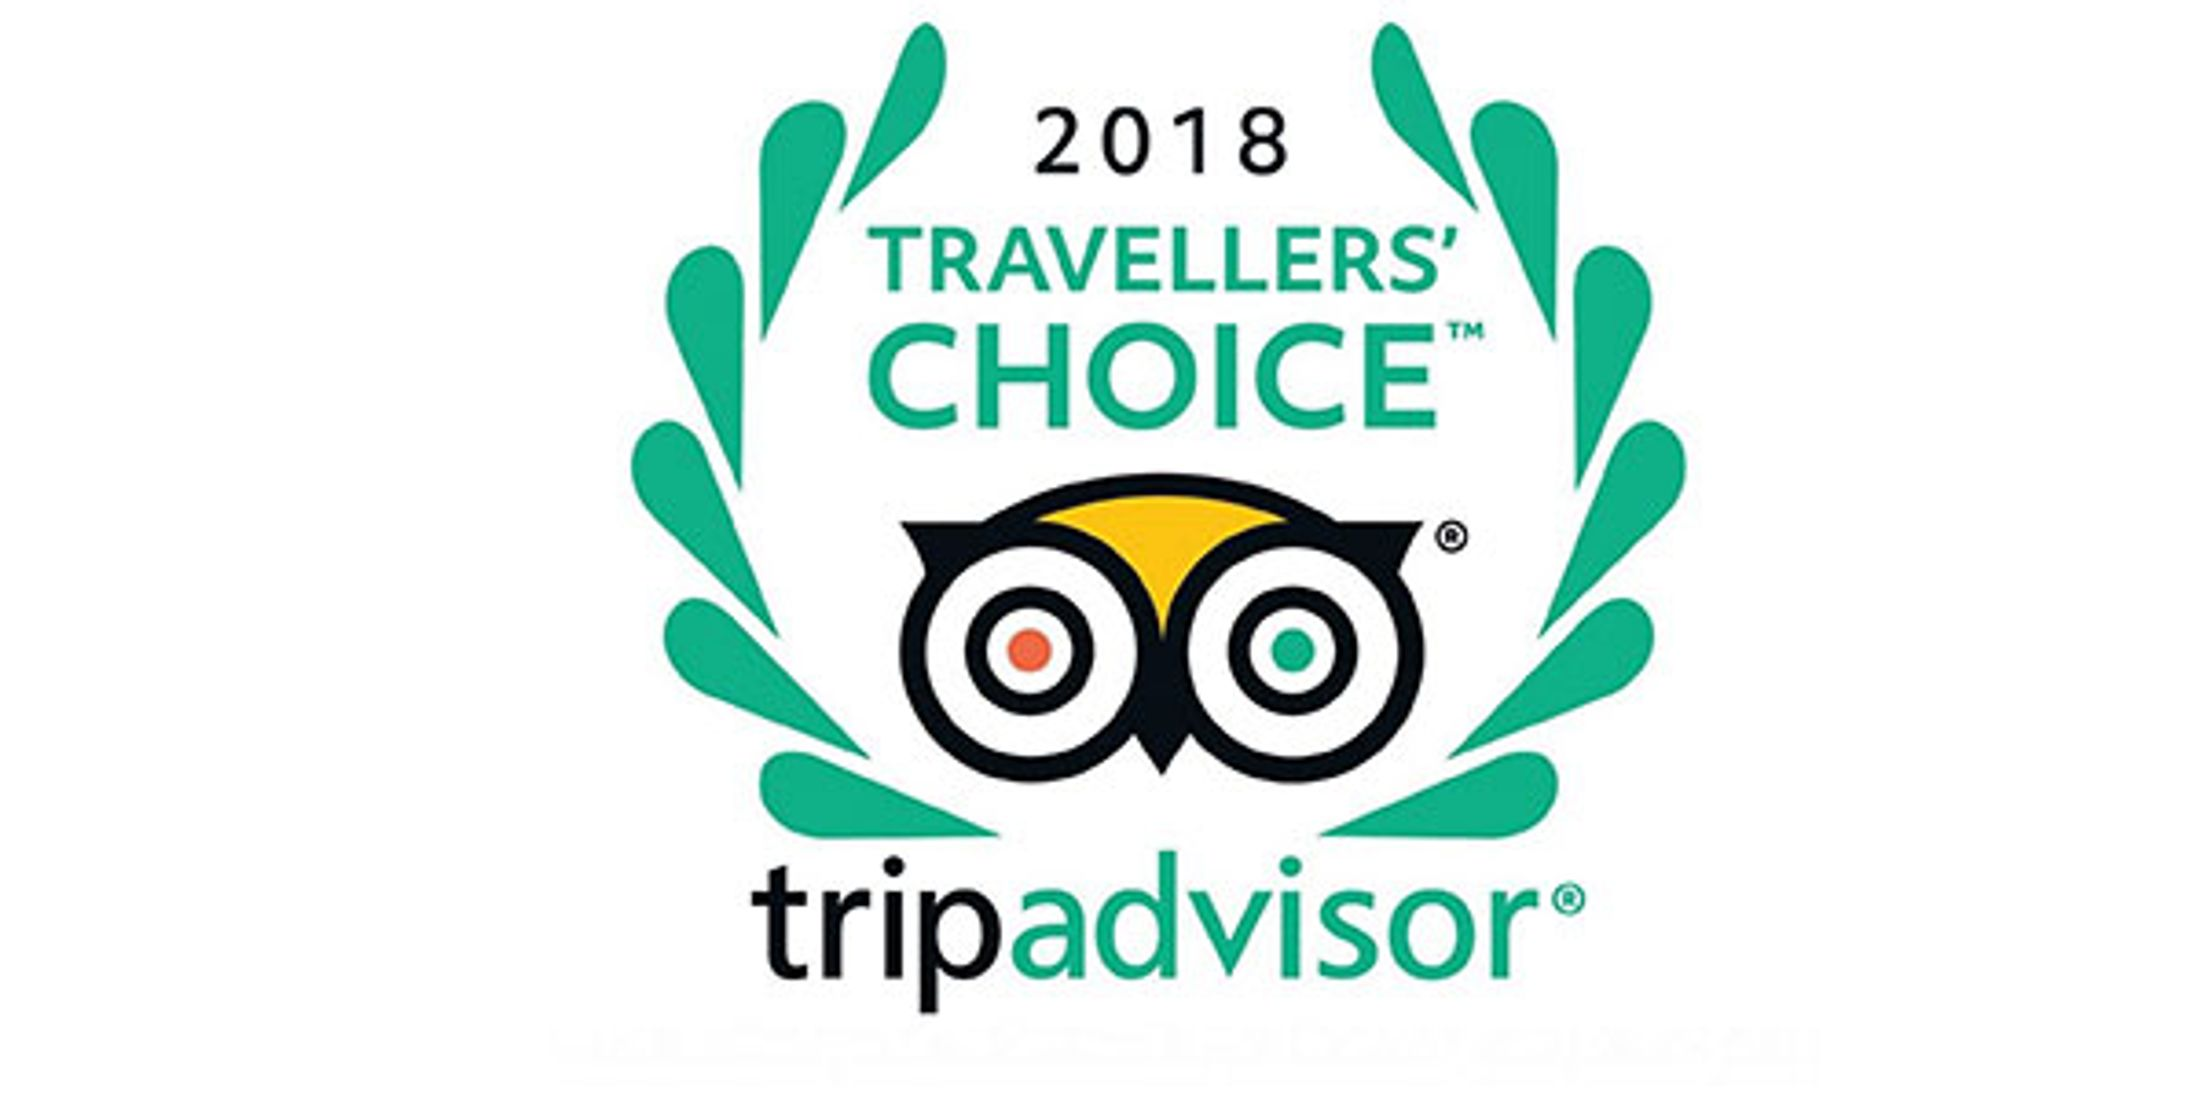 Tripadvisor Travellers Choice Award 2018